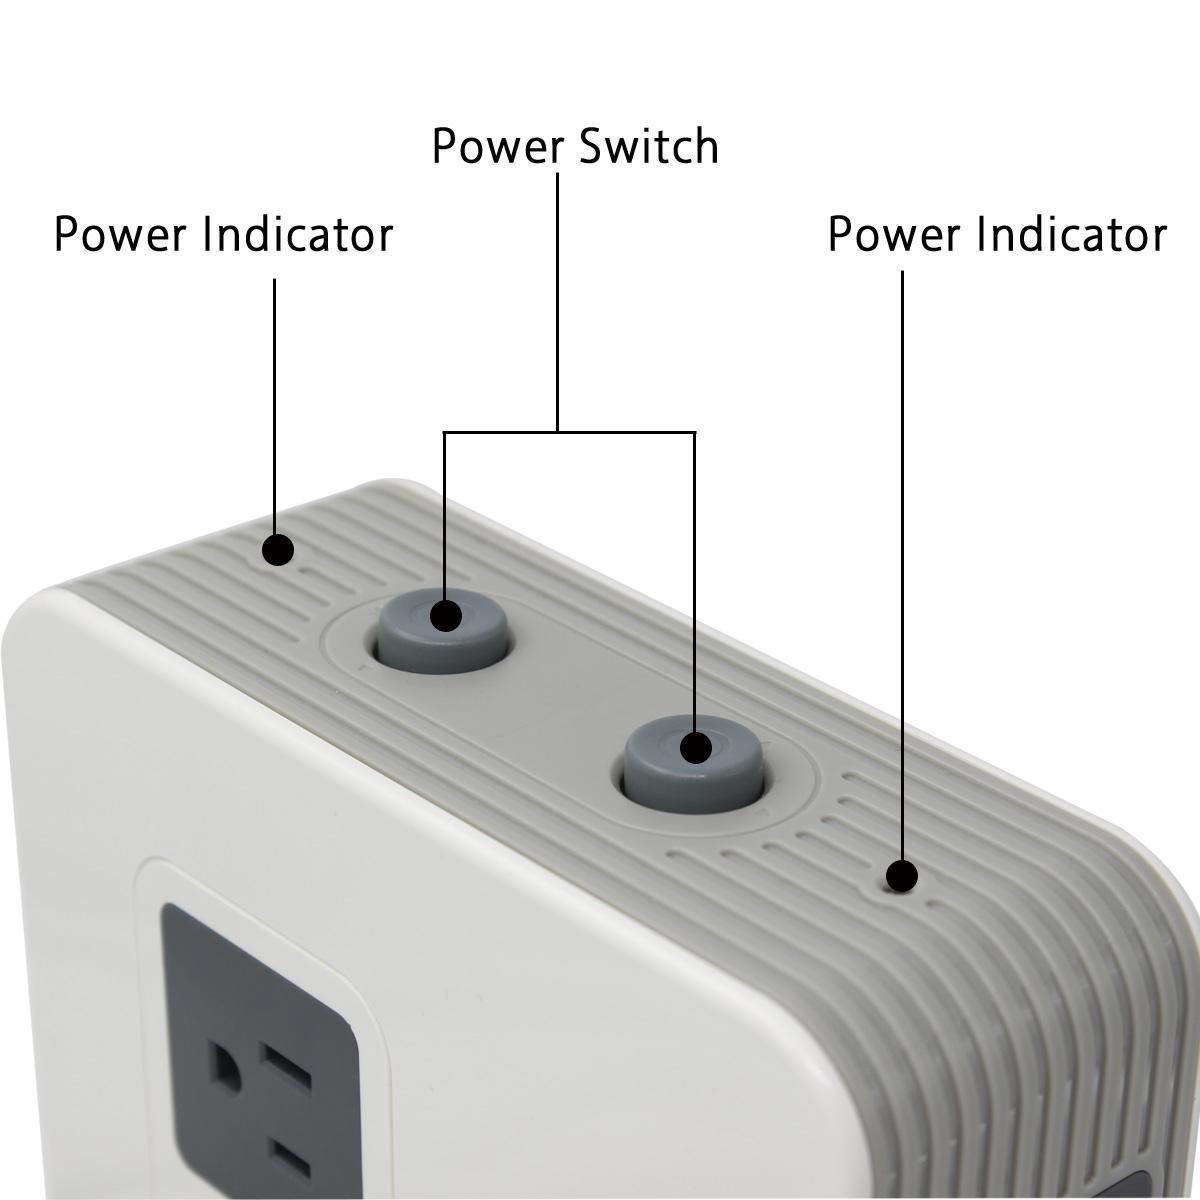 UL认可的美规过载立式插座 4